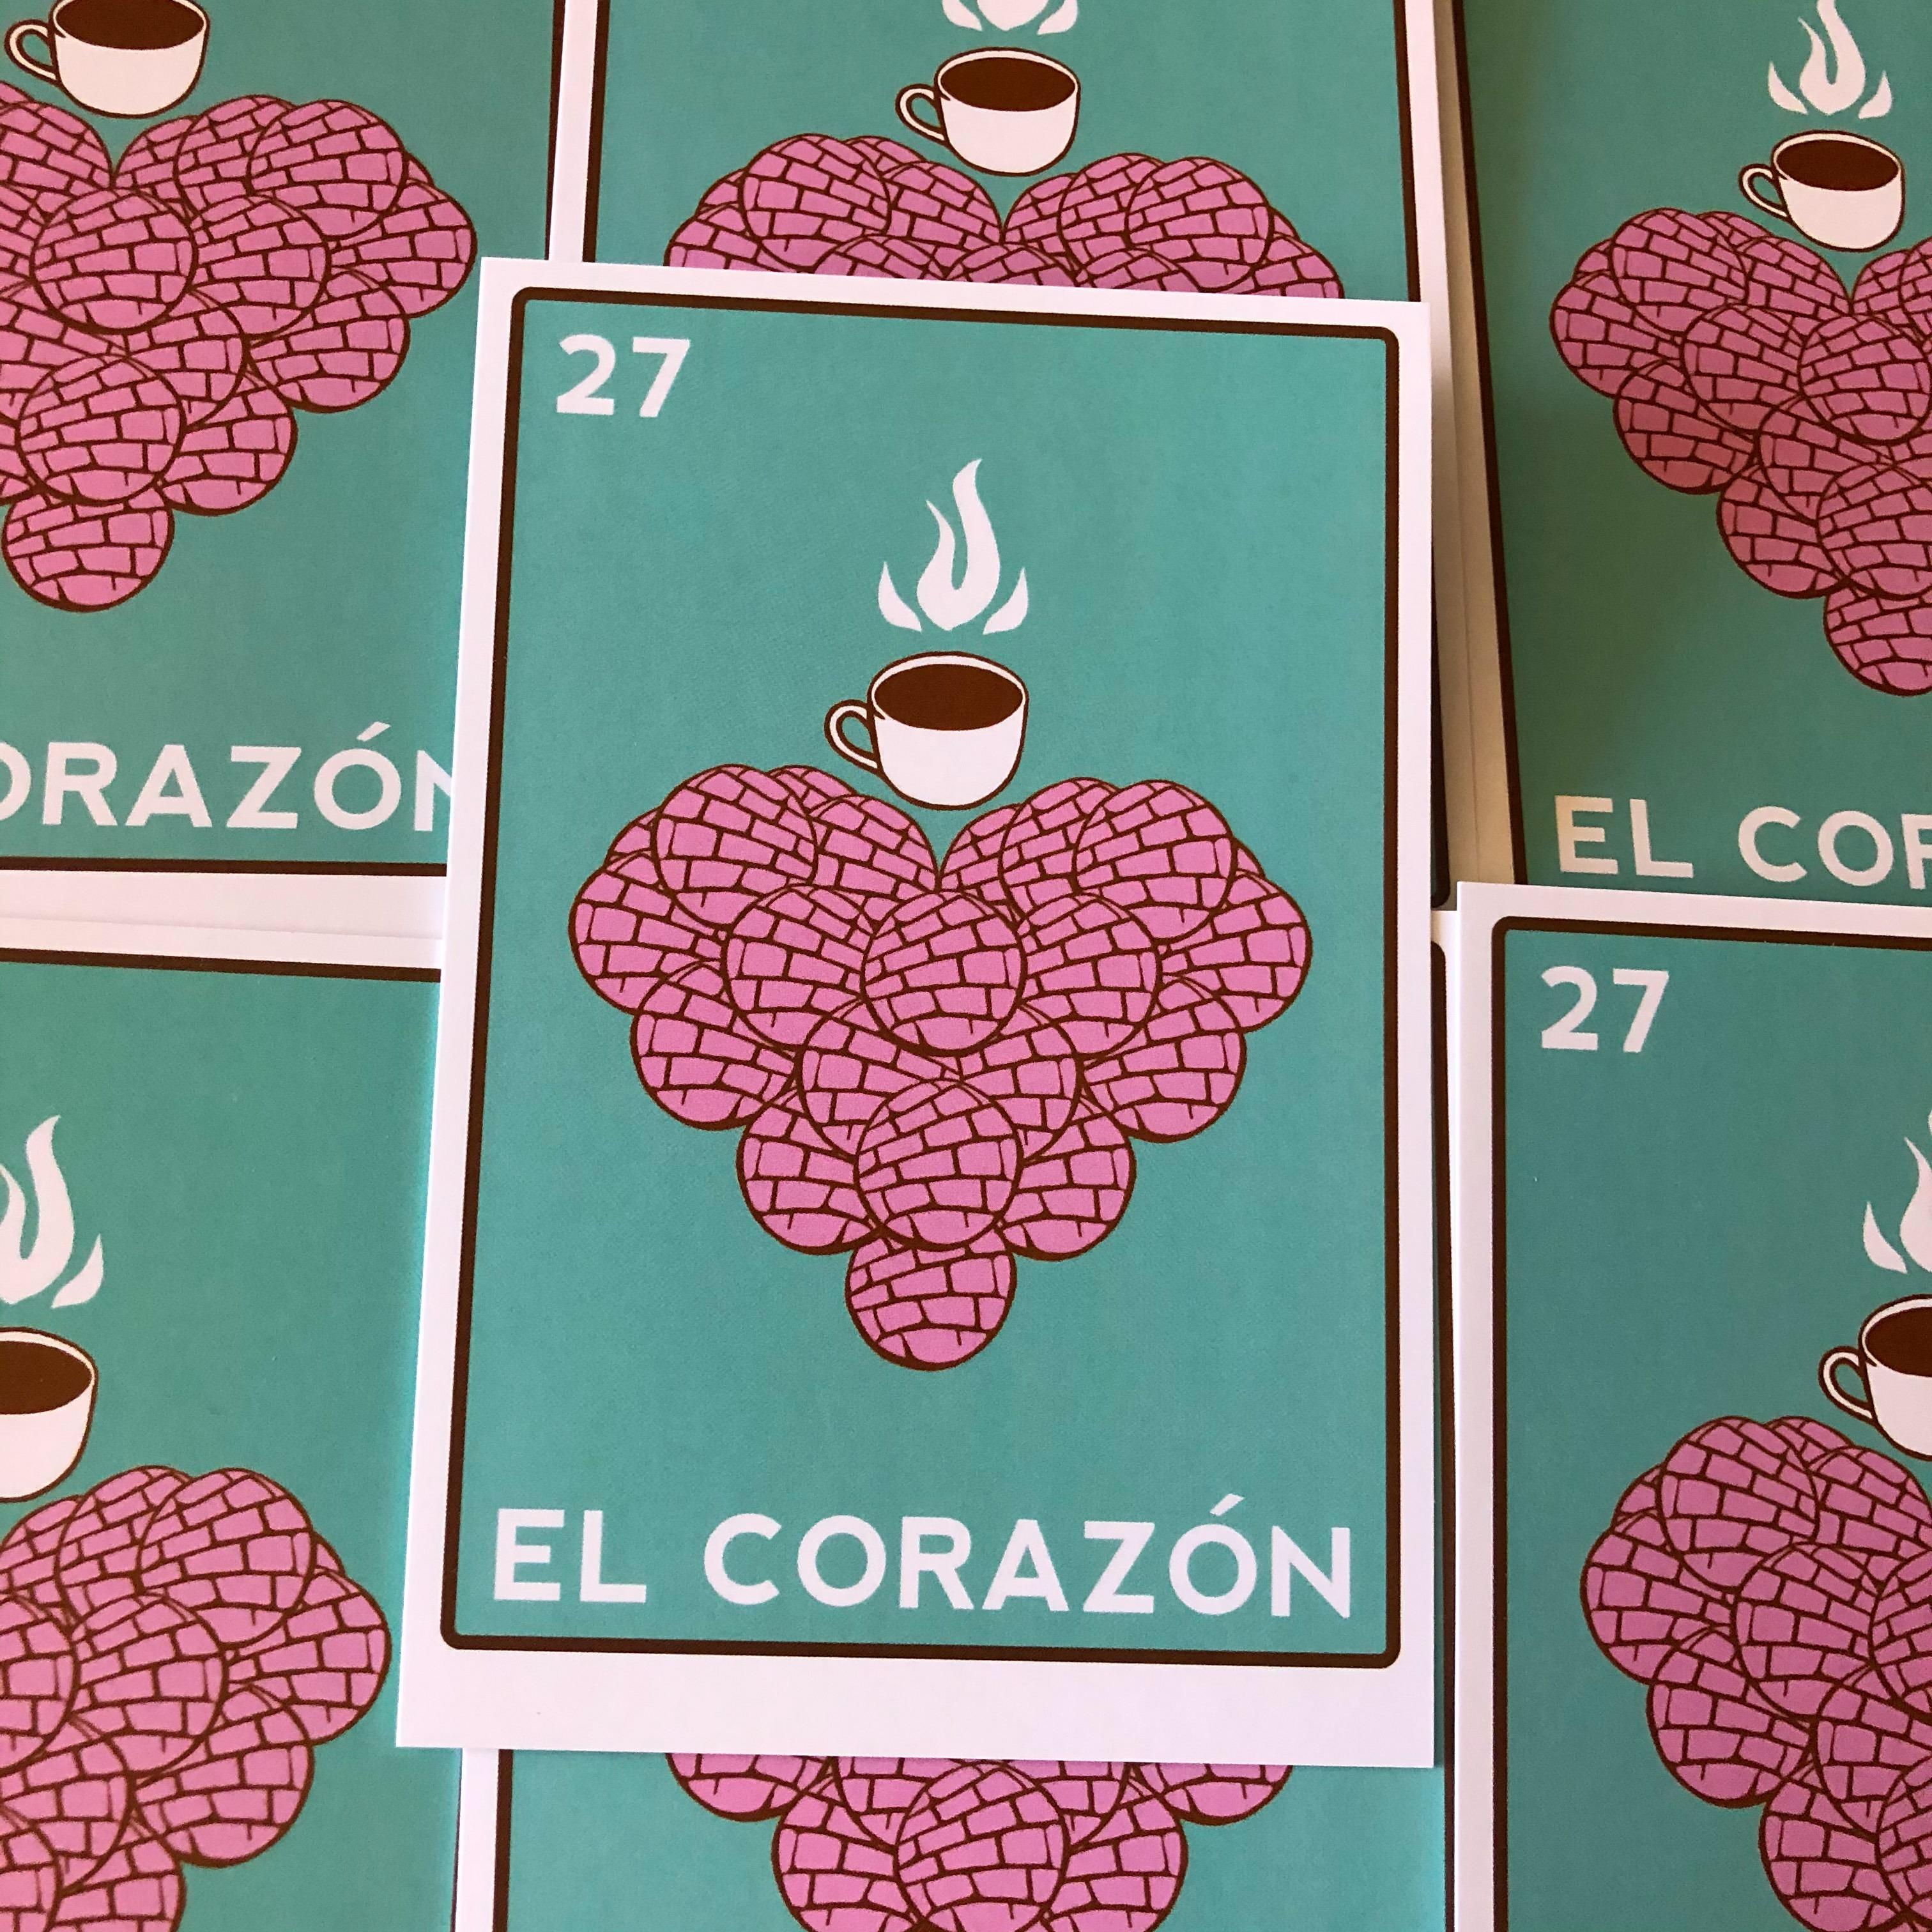 El Corazon de Pan Dulce Postcard Giveaway